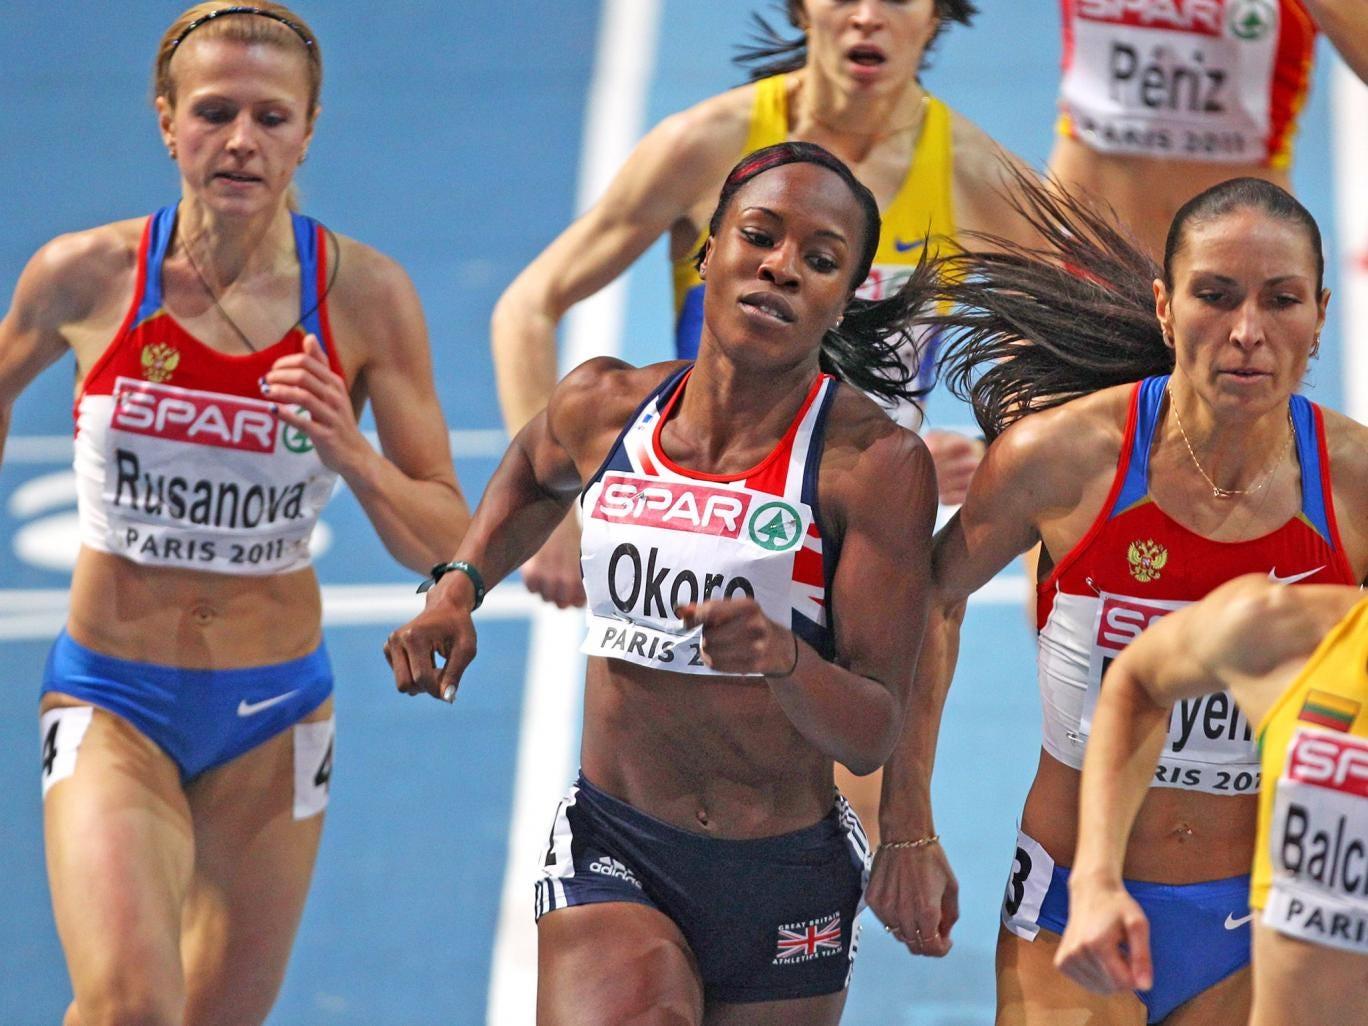 Marilyn Okoro runs during the 2011 Paris Championships. Yuliya Rusanova, left, has been caught doping